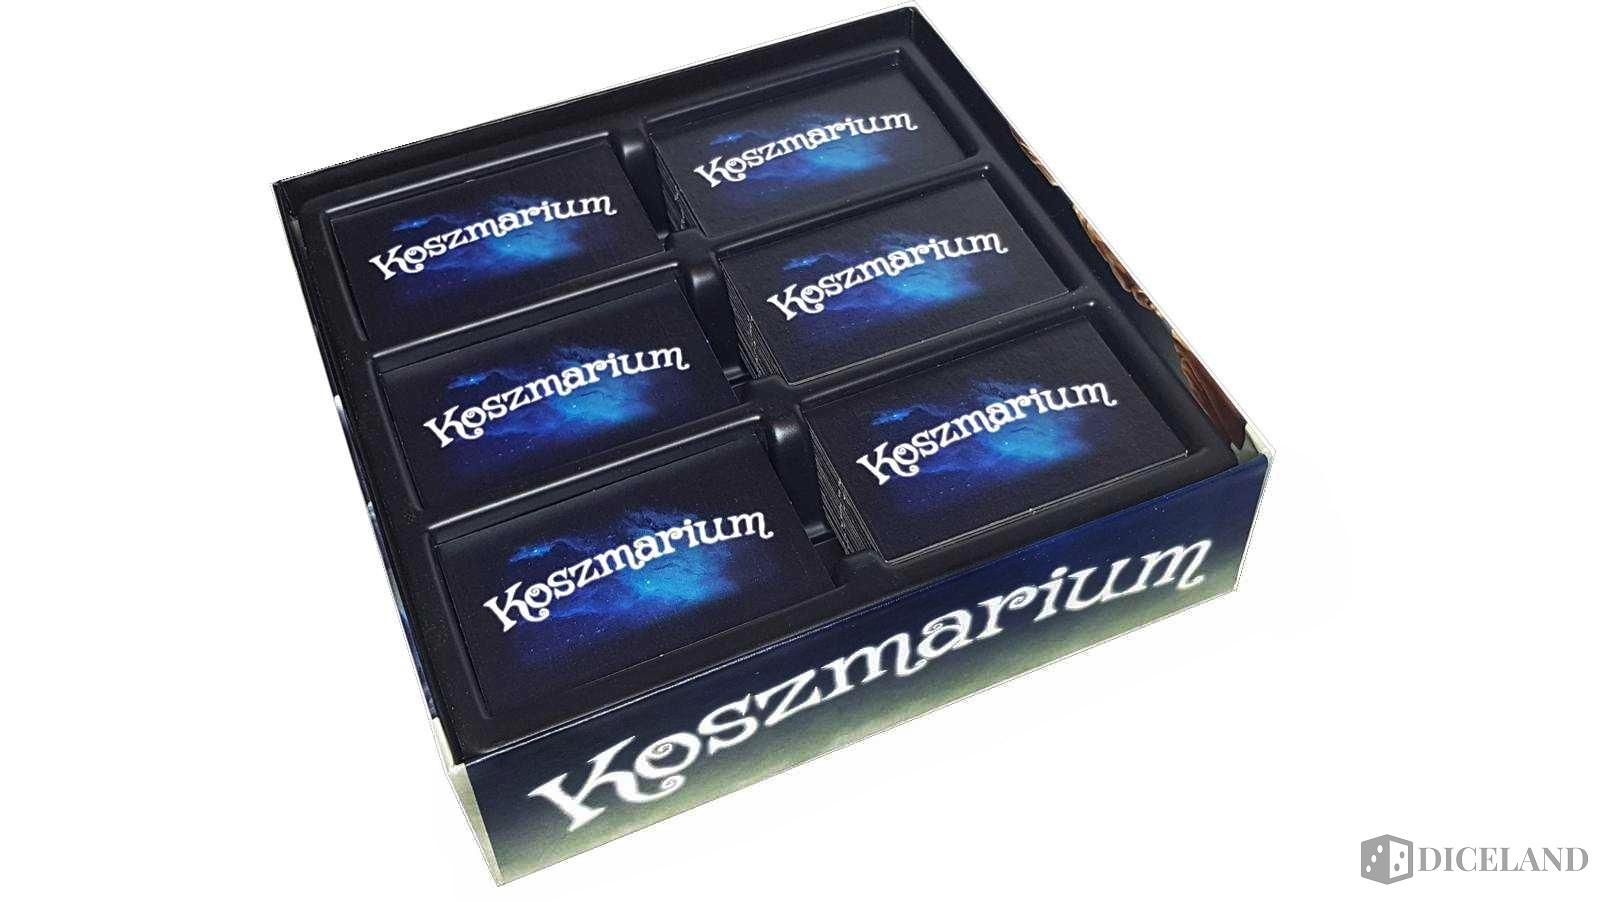 Koszmarium (2)